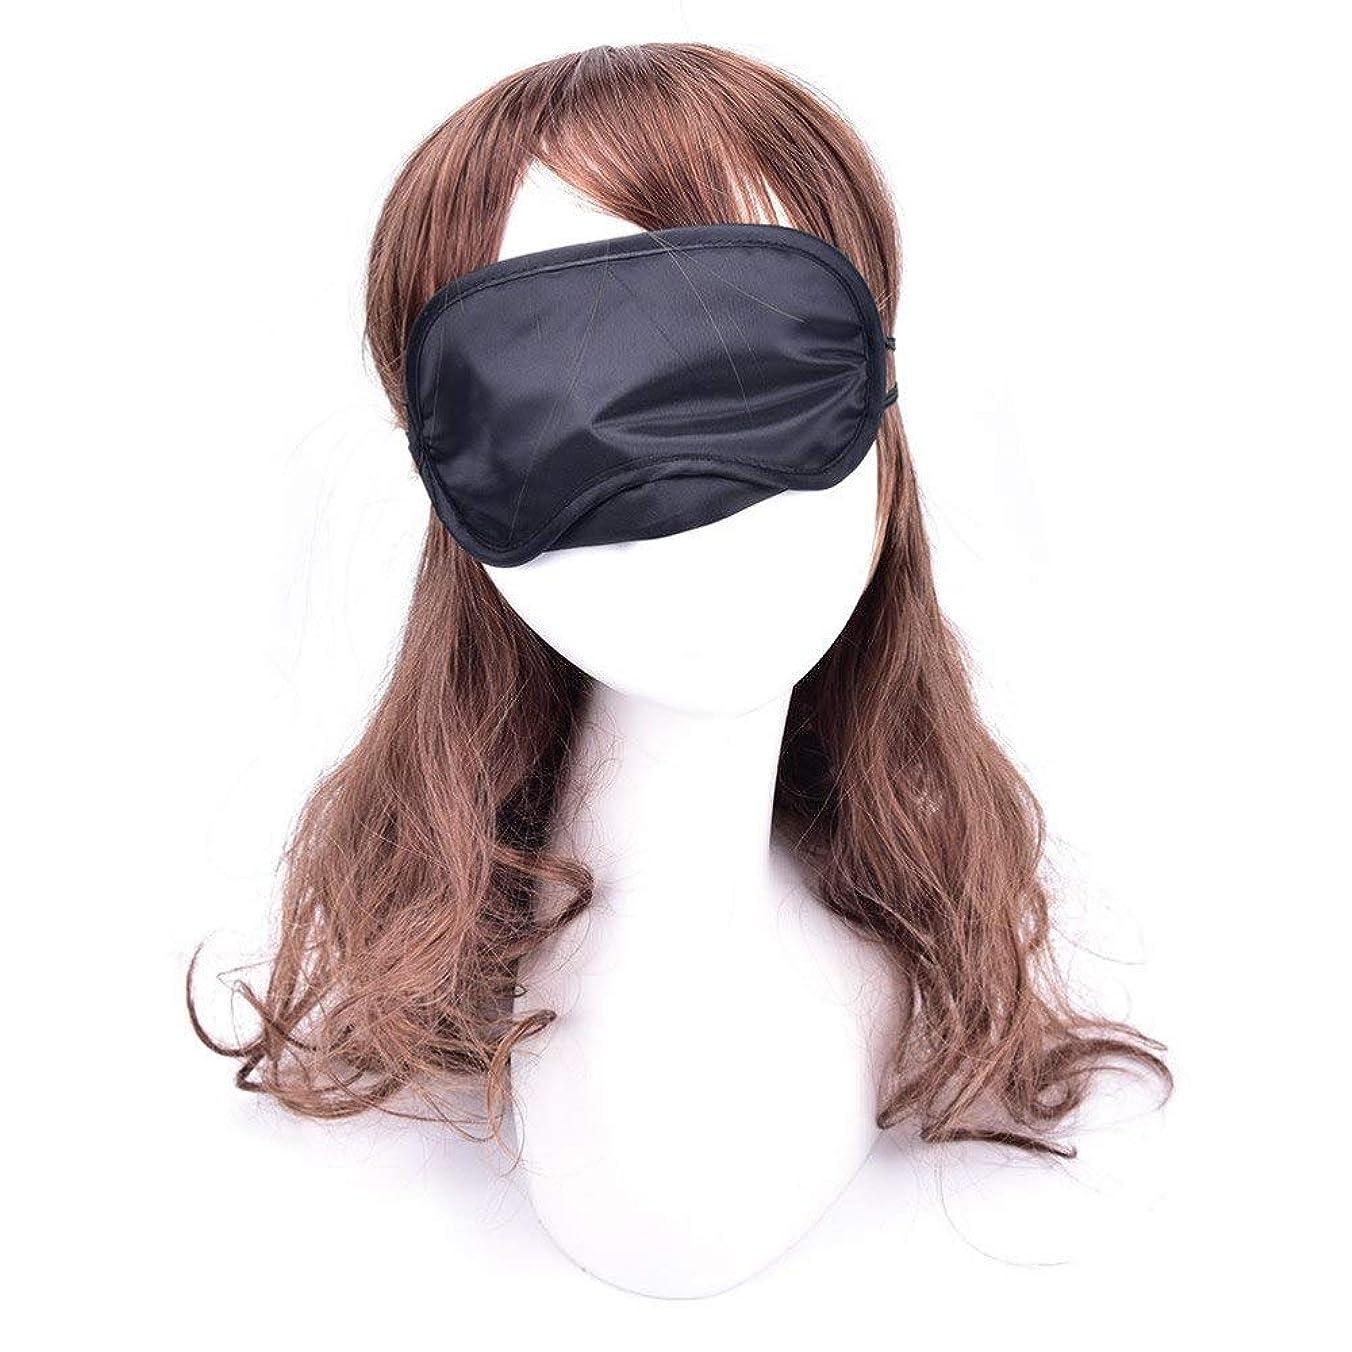 NOTE 10ピース旅行アイレストサテン睡眠目隠しマスク昼寝カバーソフト睡眠マスクアイシェード